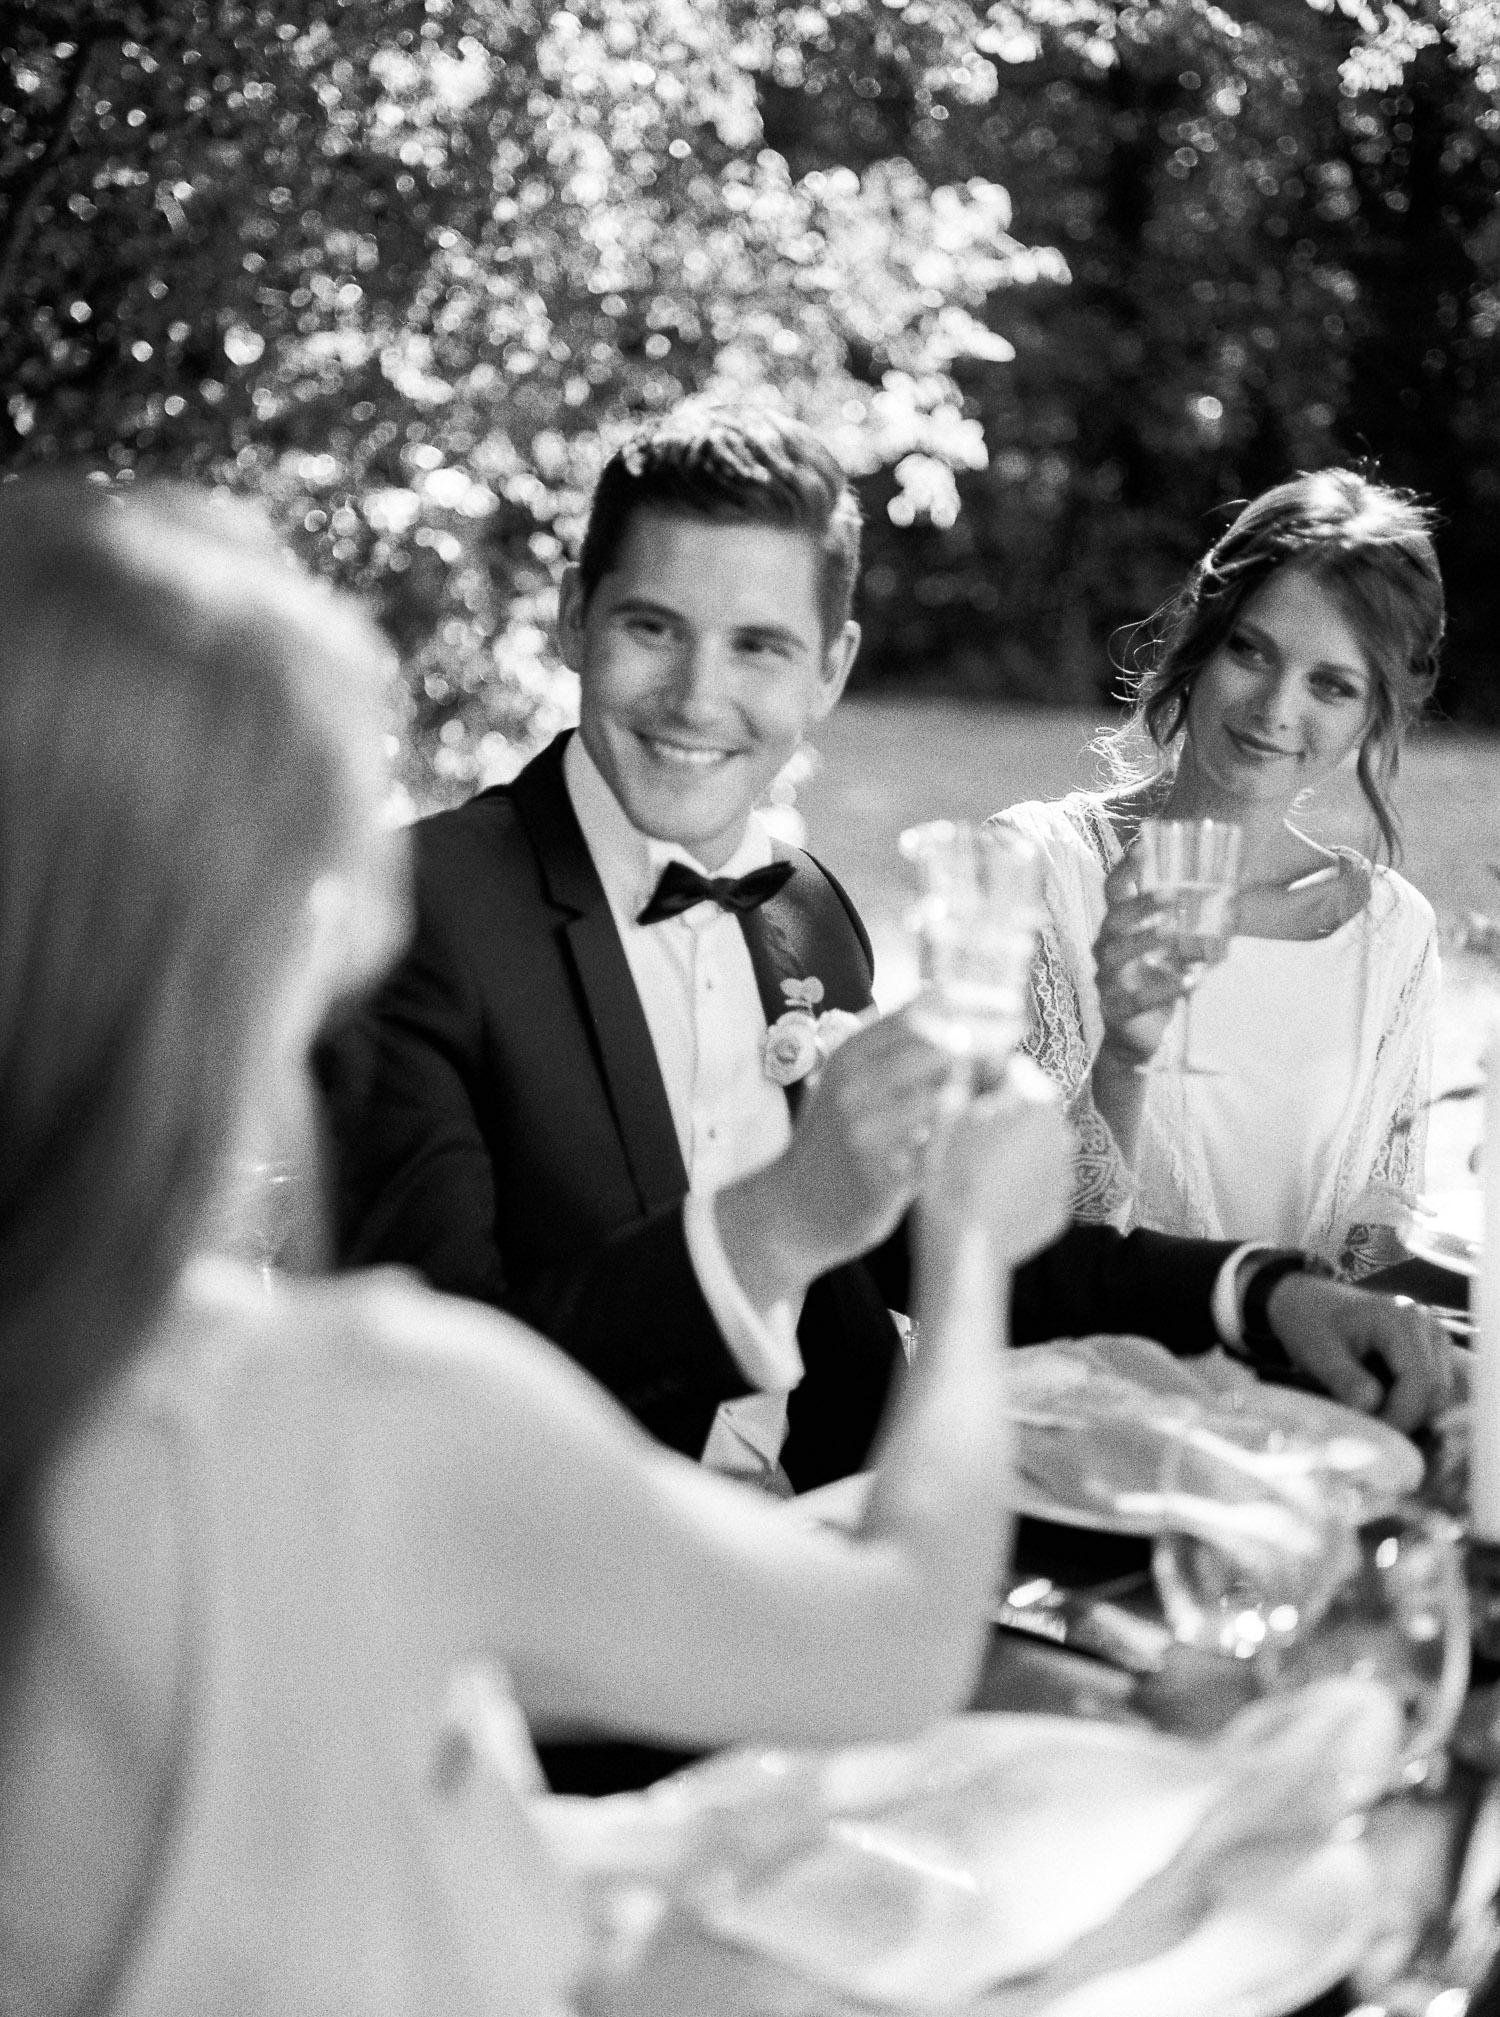 wedding destination, Loire Valley, french art de vivre, gathering, wedding dinner, authentic moment, wedding designer, creative director, Veronique Lorre